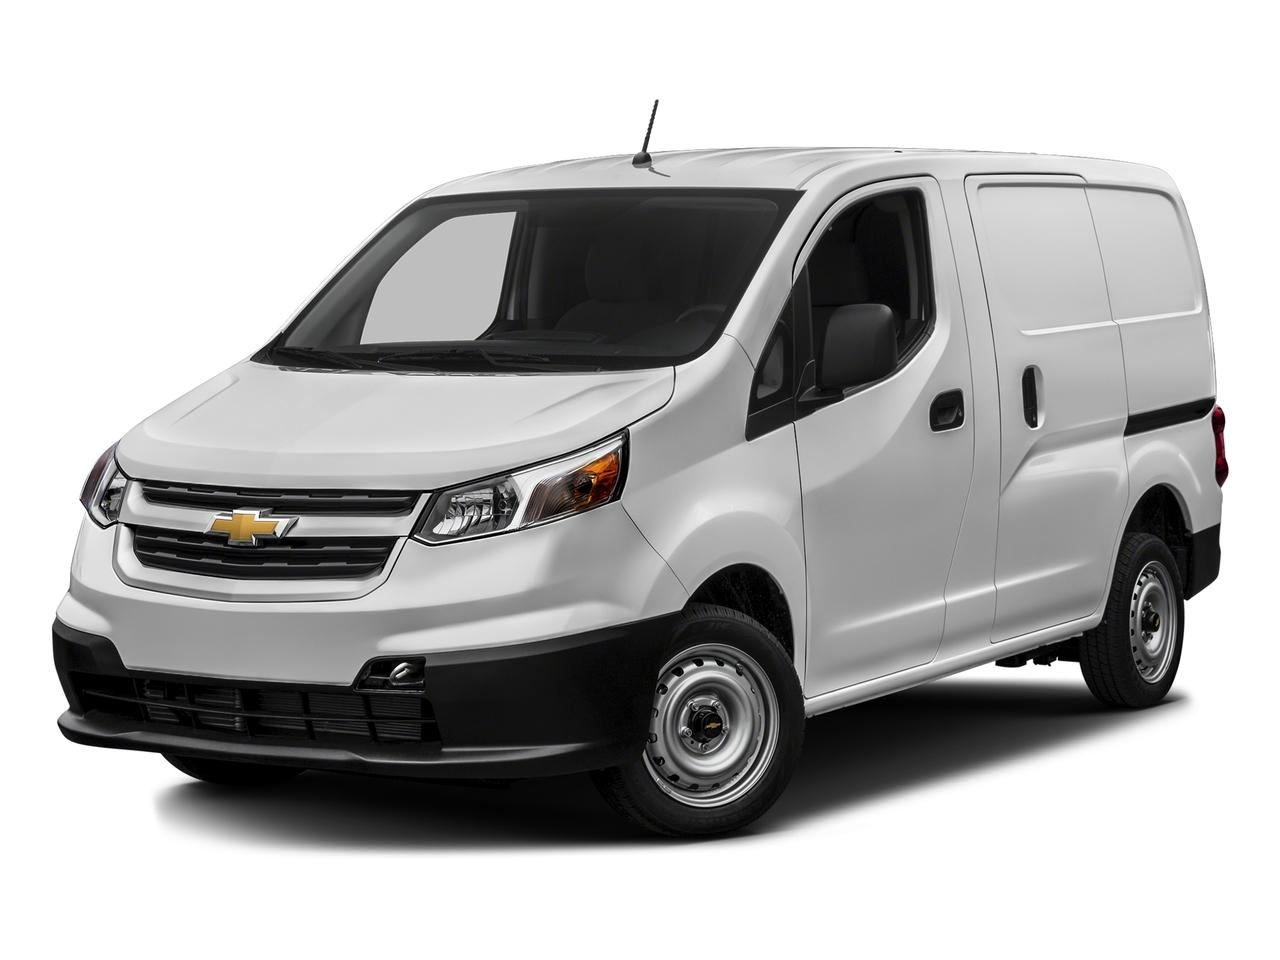 2017 Chevrolet City Express Cargo Van Vehicle Photo in Peoria, IL 61615